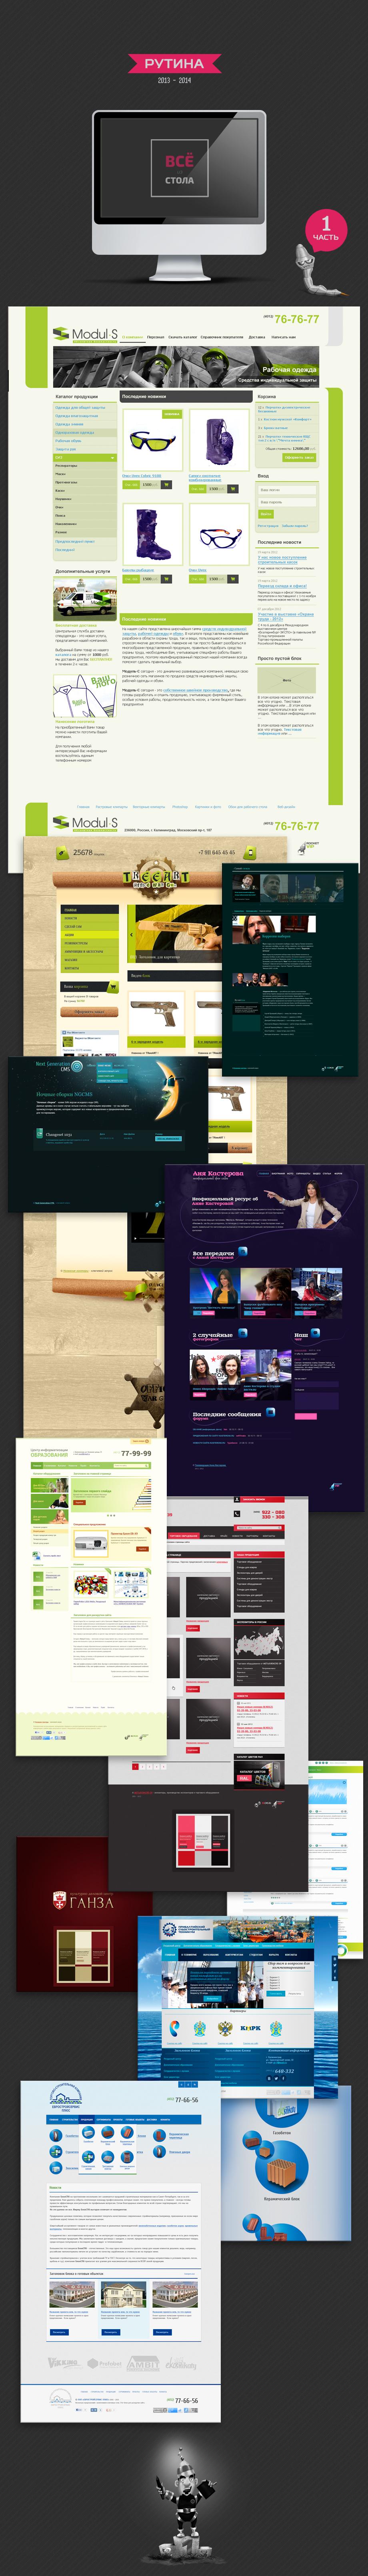 portfolio_old_2013.jpg (2.89 Mb)